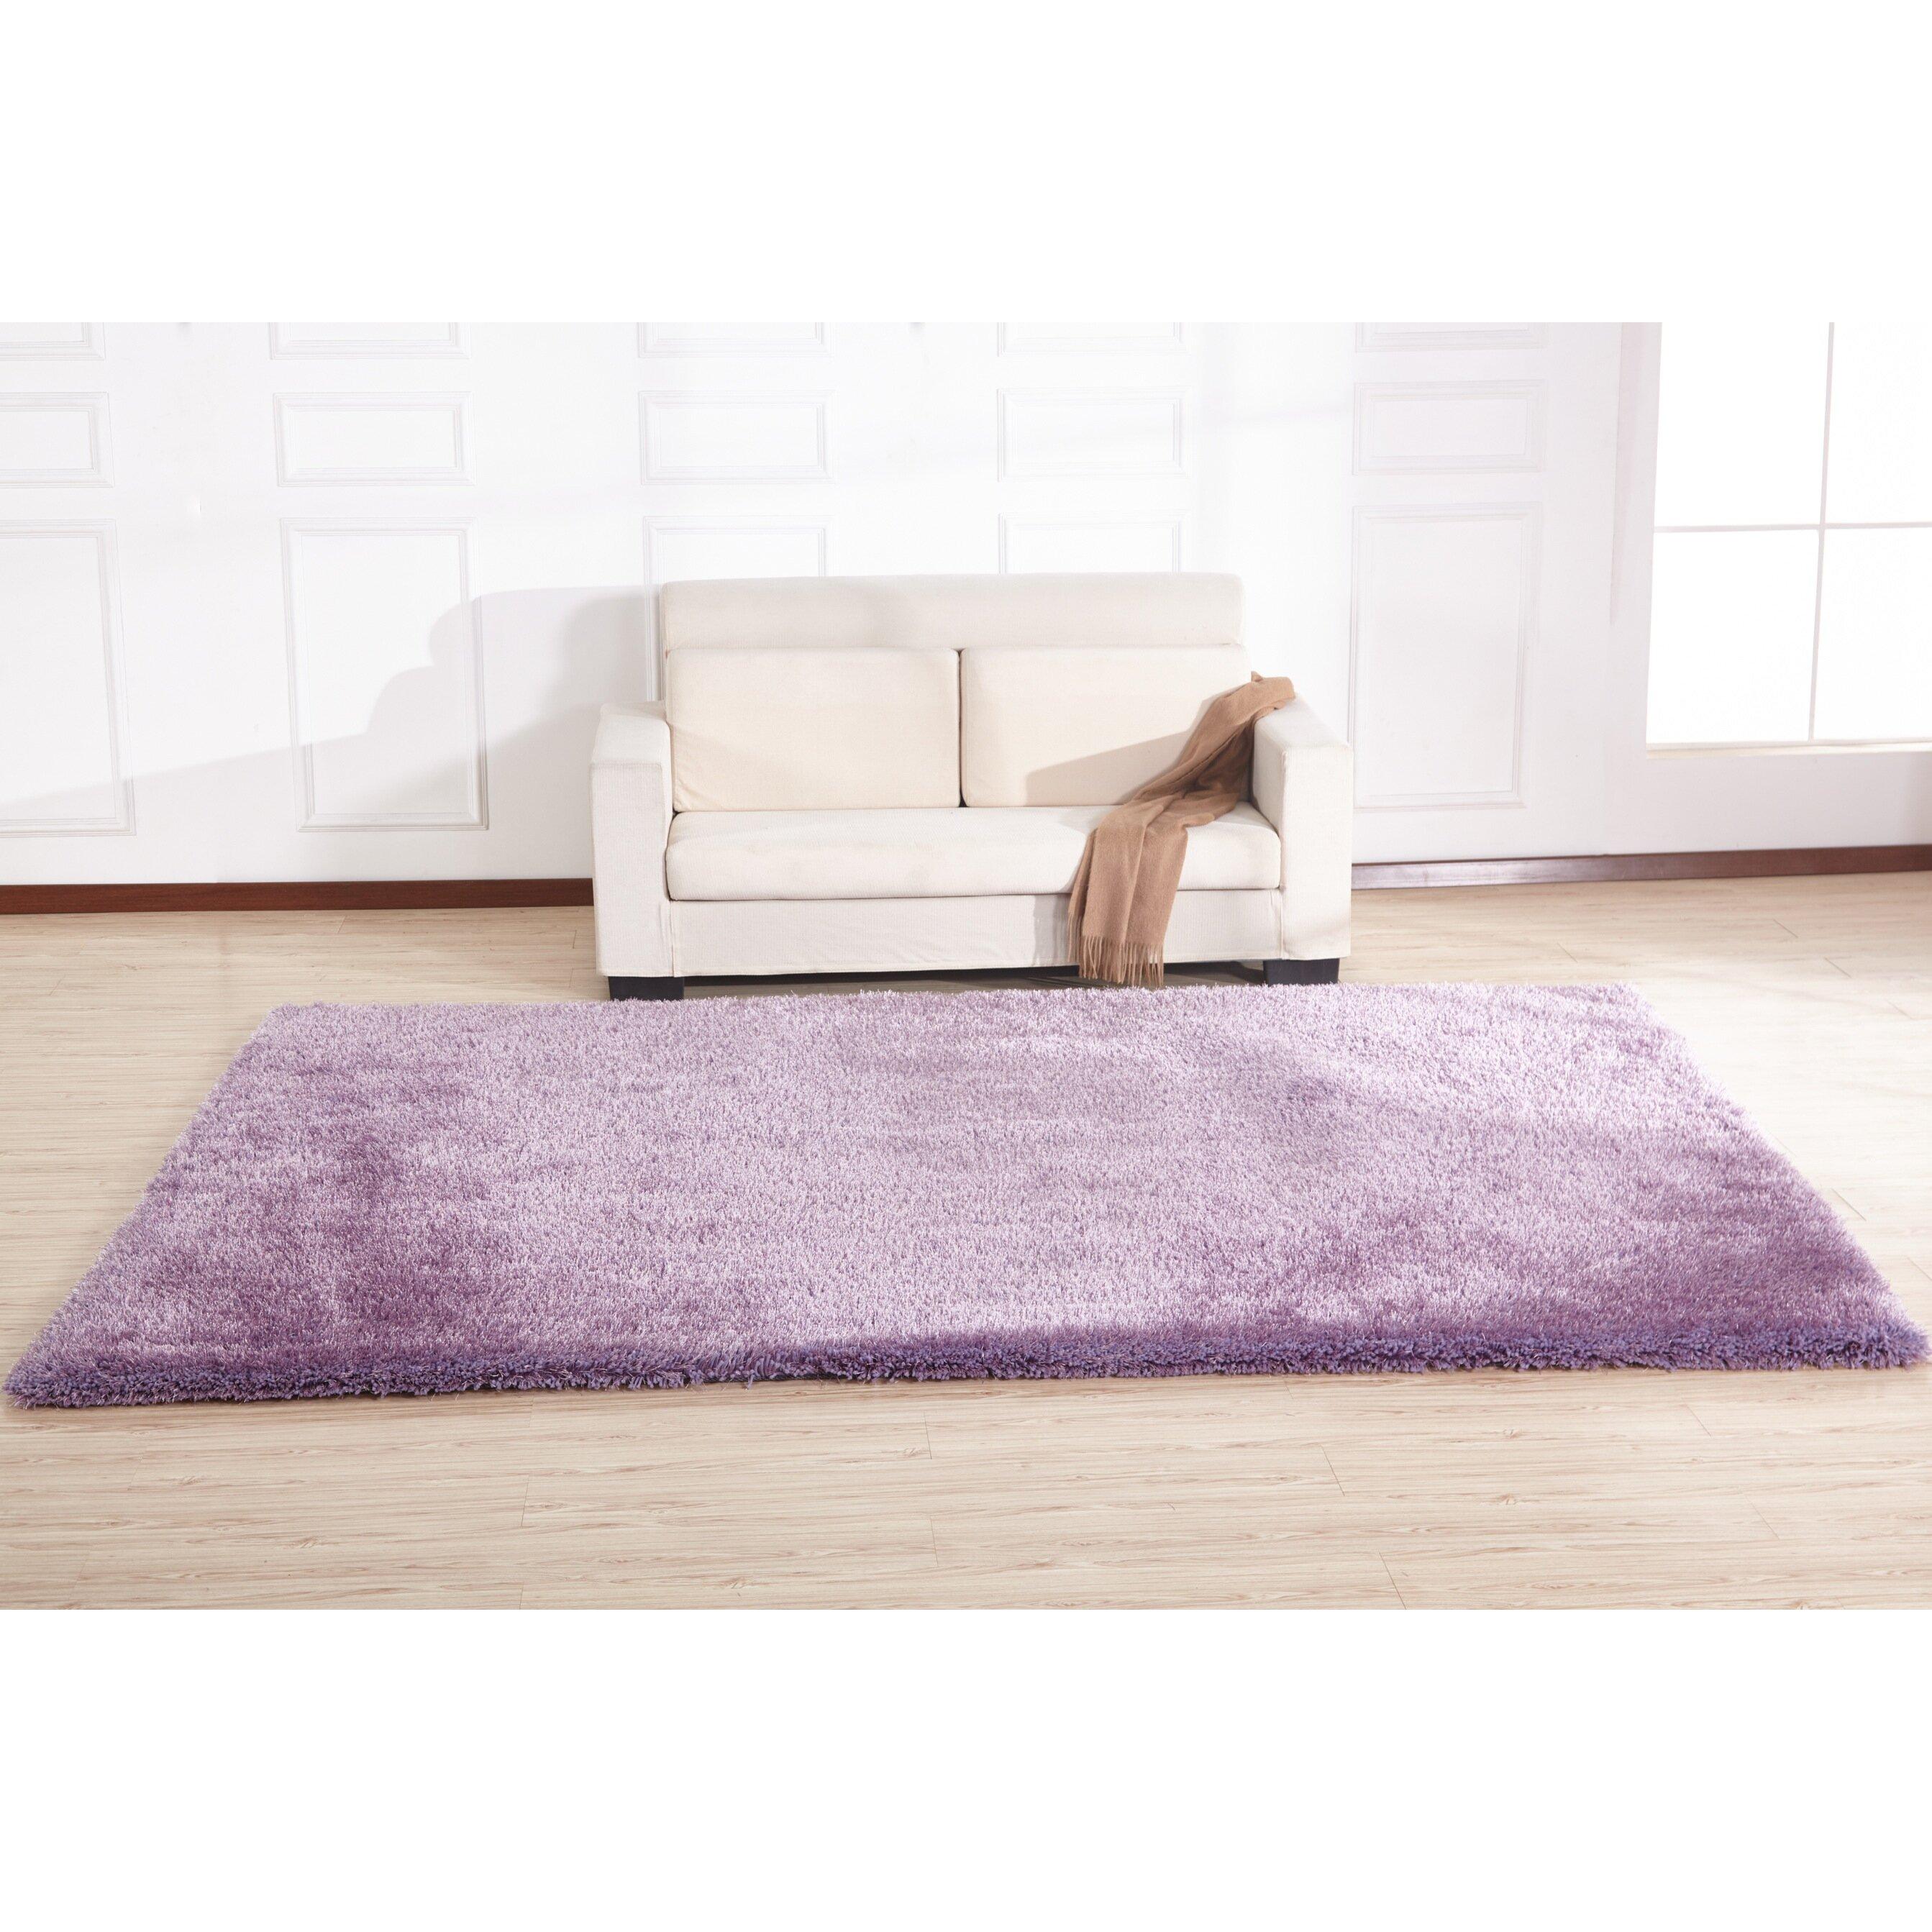 Lavender Rug: Rug Factory Plus Hand-Tufted Lavender Area Rug & Reviews